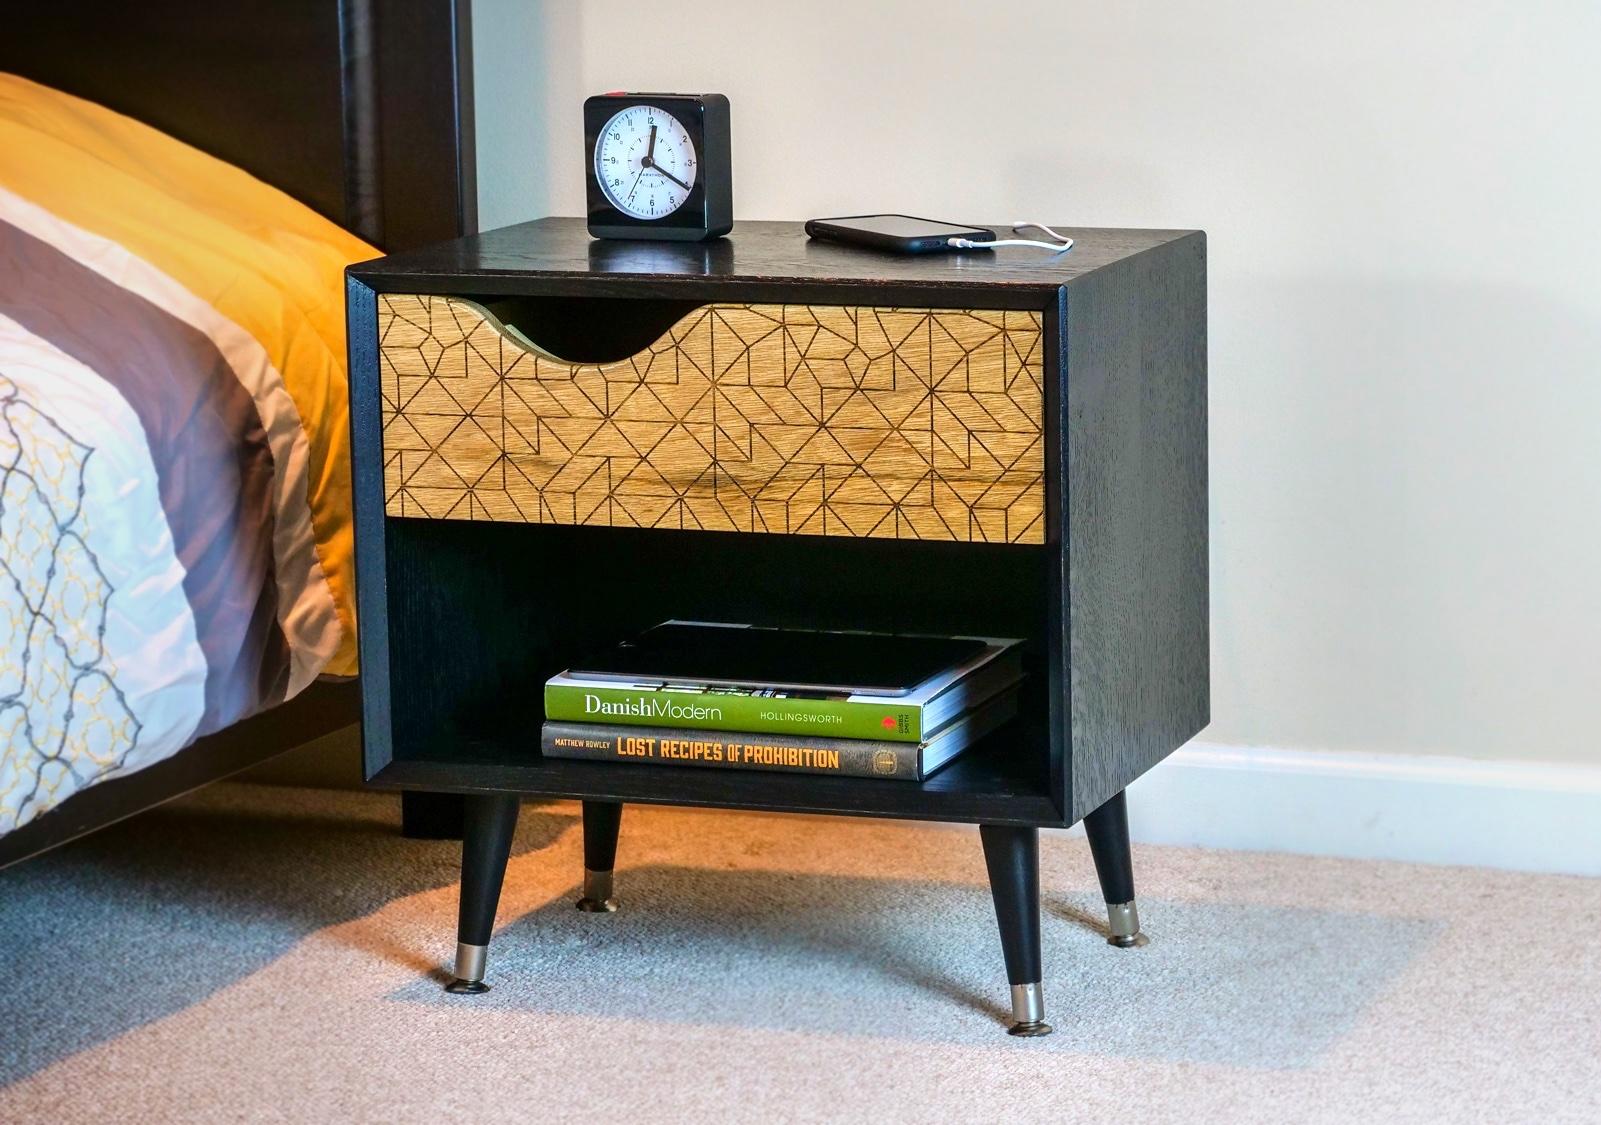 Mid Century Modern Nightstand Plans: DIY Mid-Century Modern Bedside Table / Nightstand With